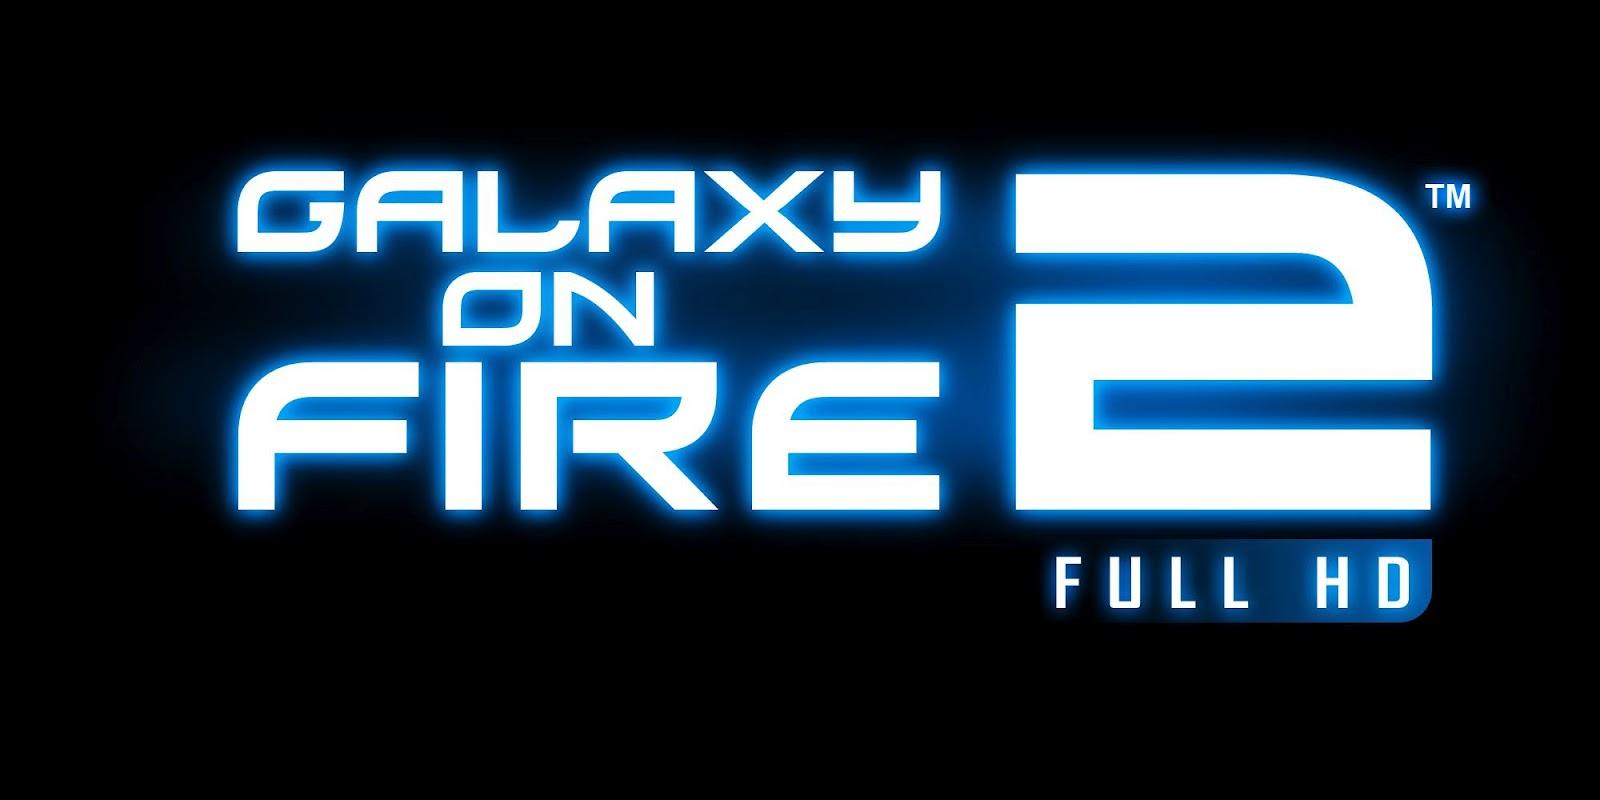 Samsung galaxy star pro live wallpaper download